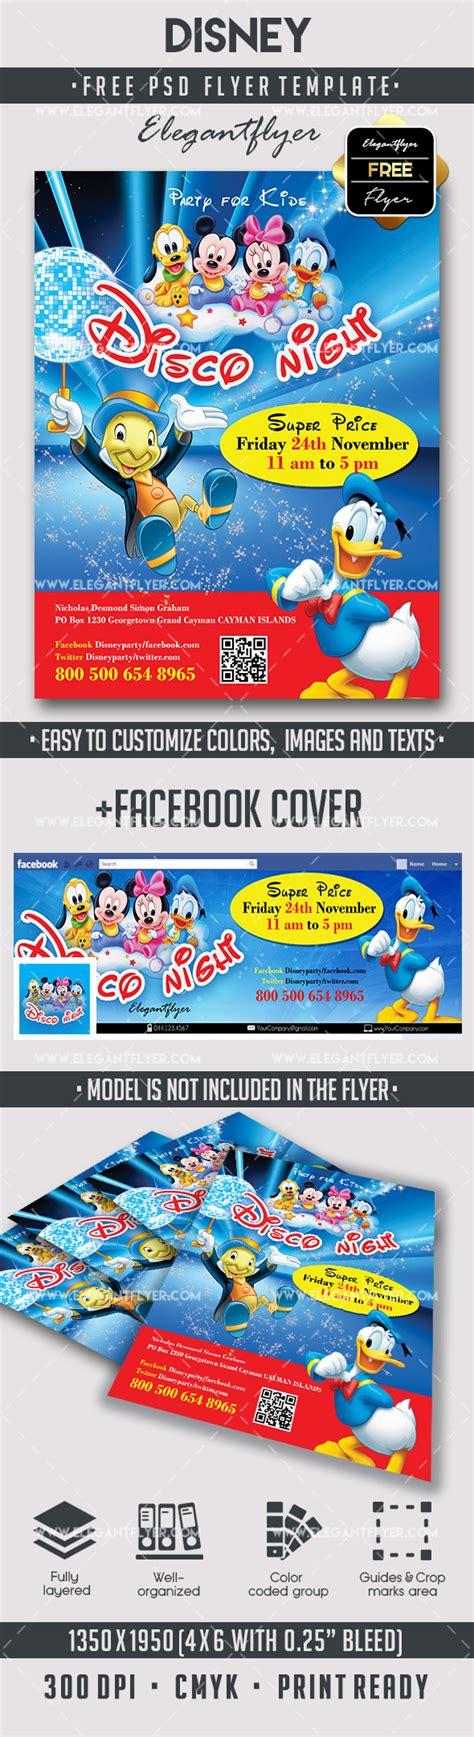 Disney Free Flyer Psd Template By Elegantflyer Disney Flyer Template